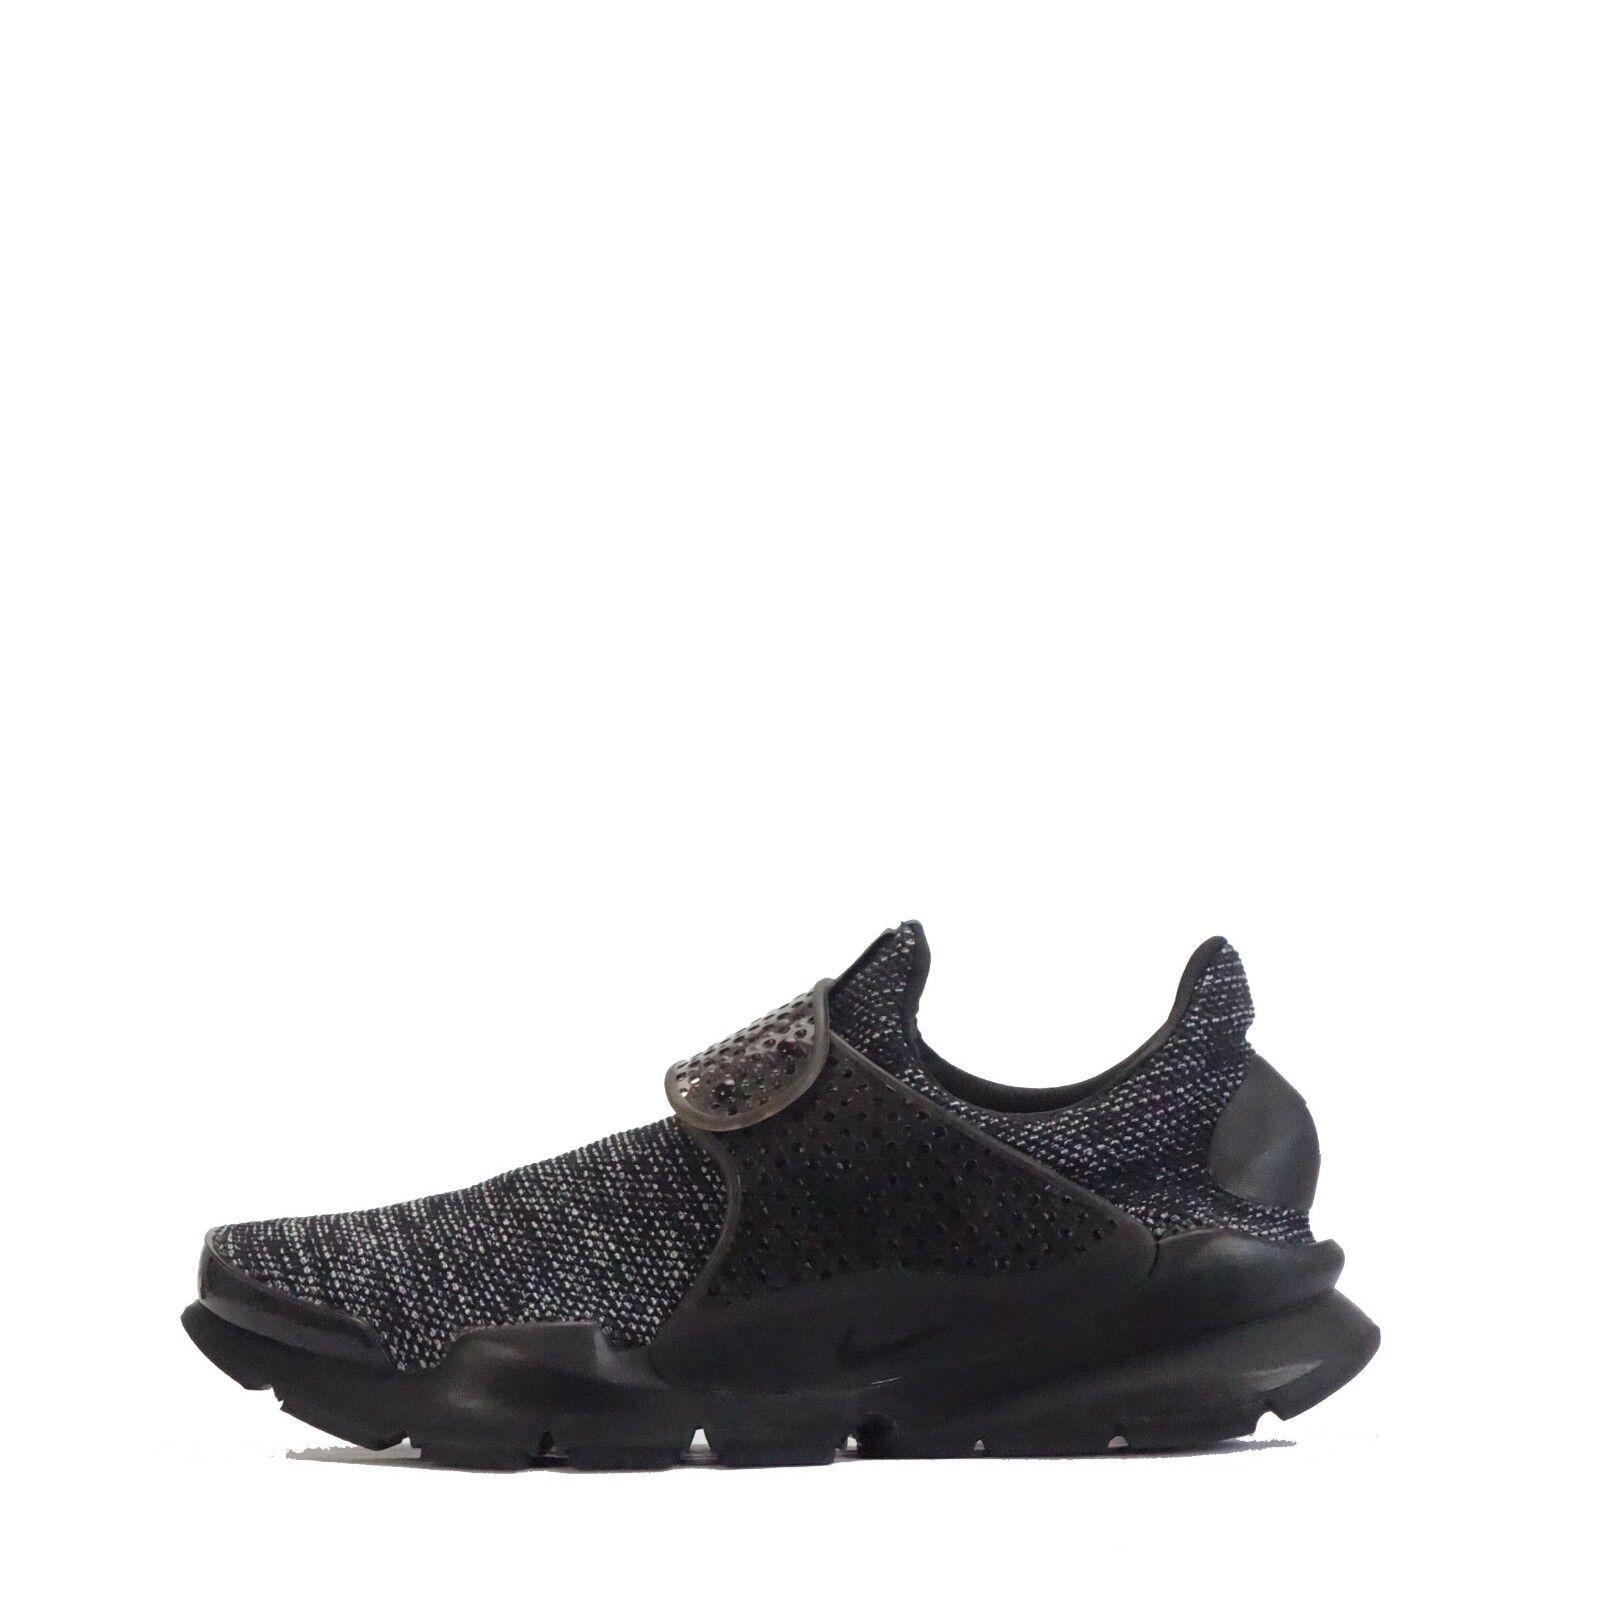 Nike Socke Dart Atmen Herren Trainers Black/Black